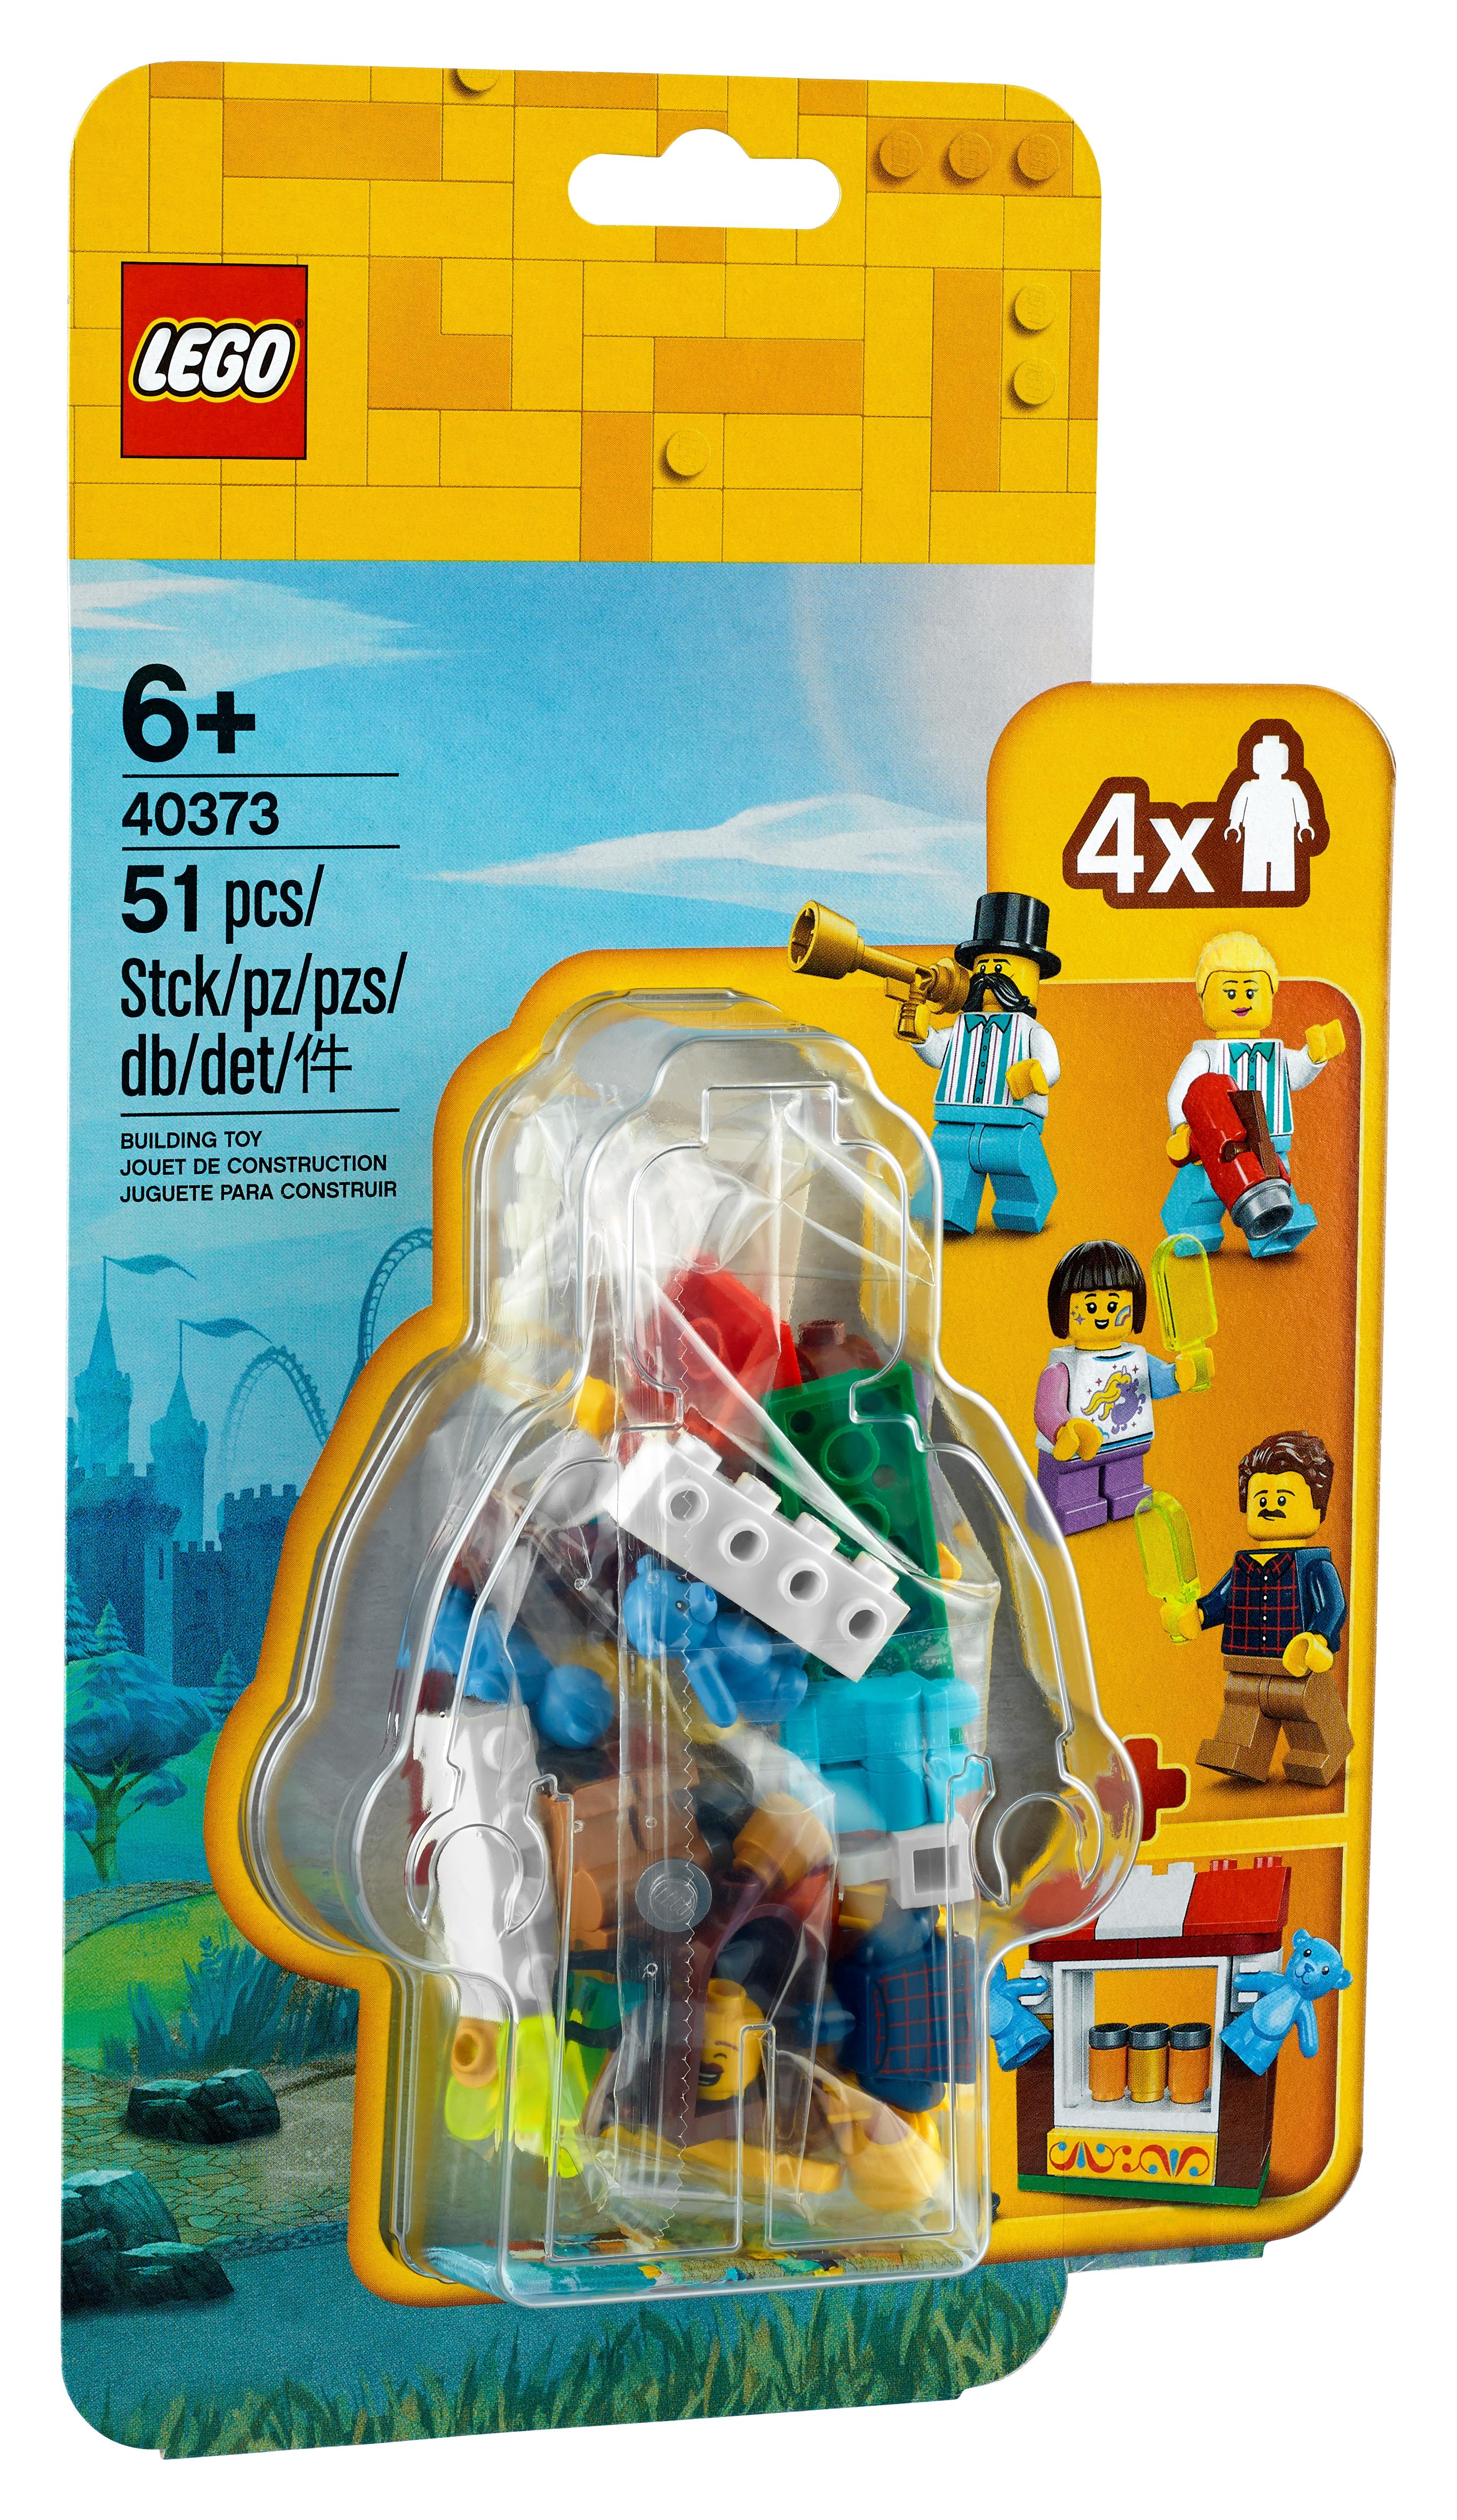 LEGO Minifigures 40373 Tillbehörsset till nöjesfältminifigurer